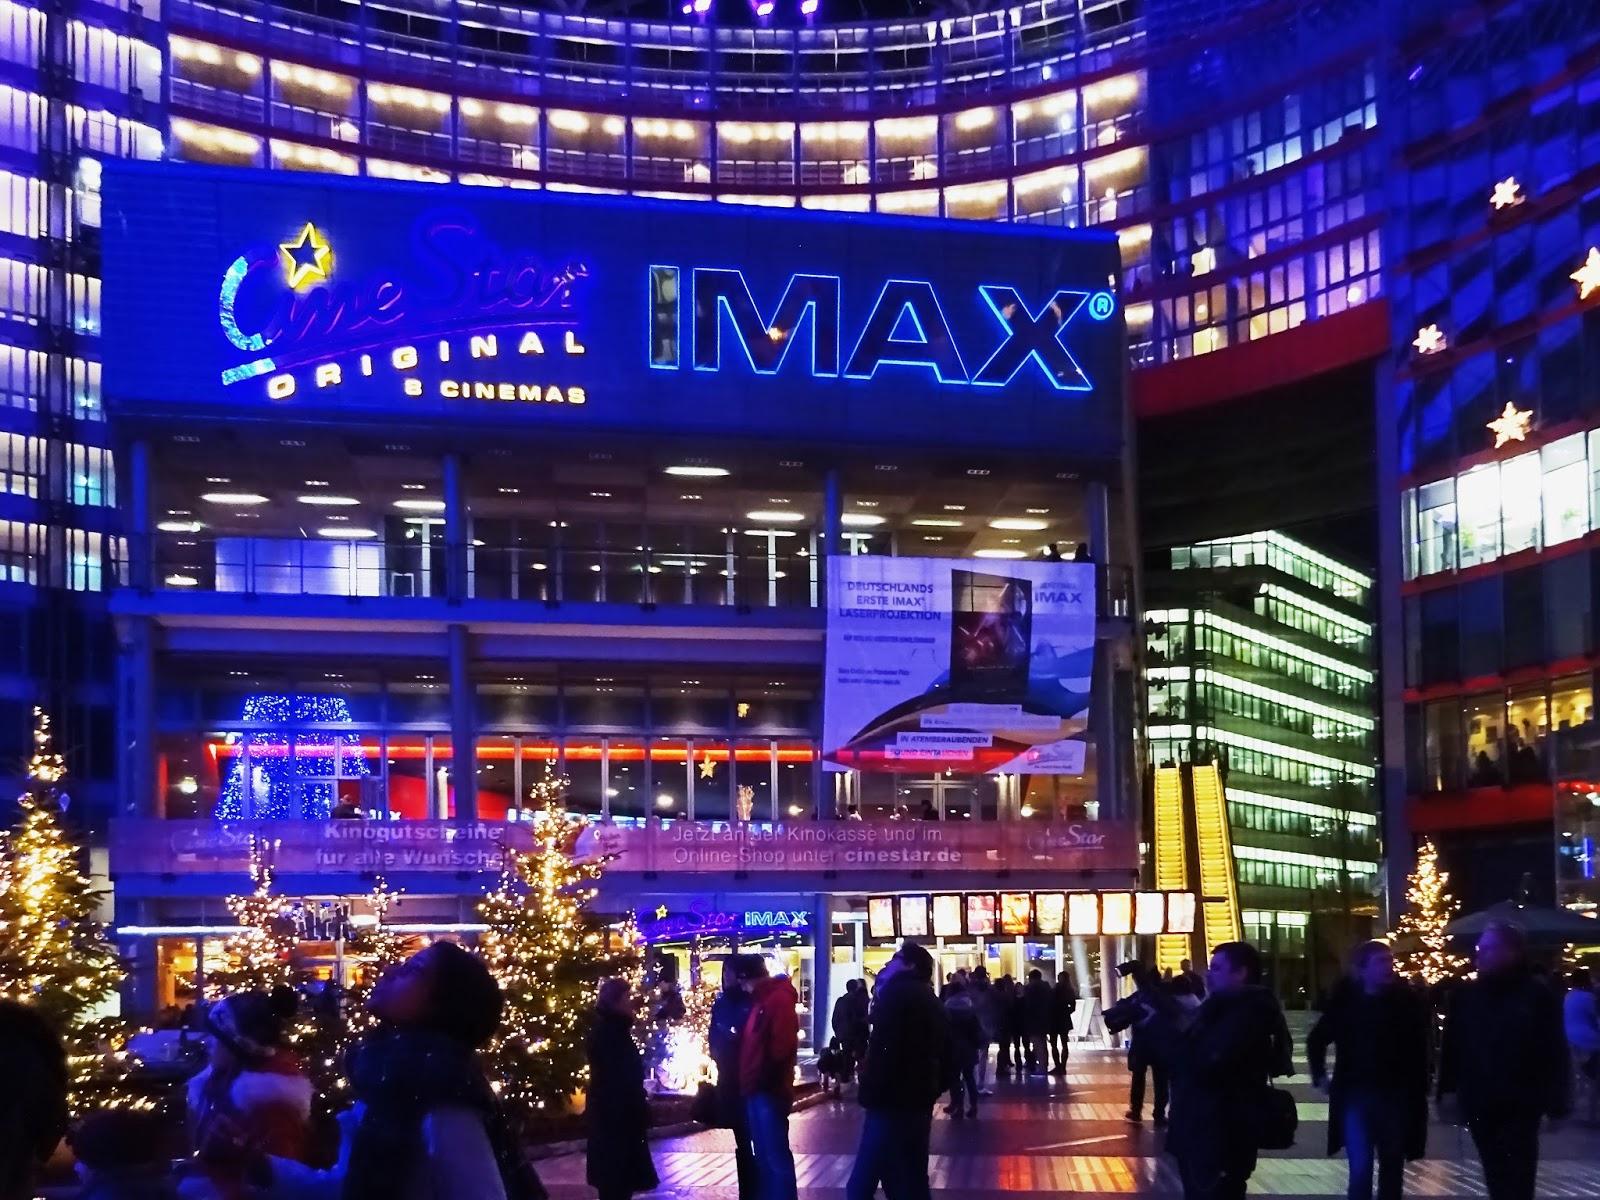 Sony Center Cinestar